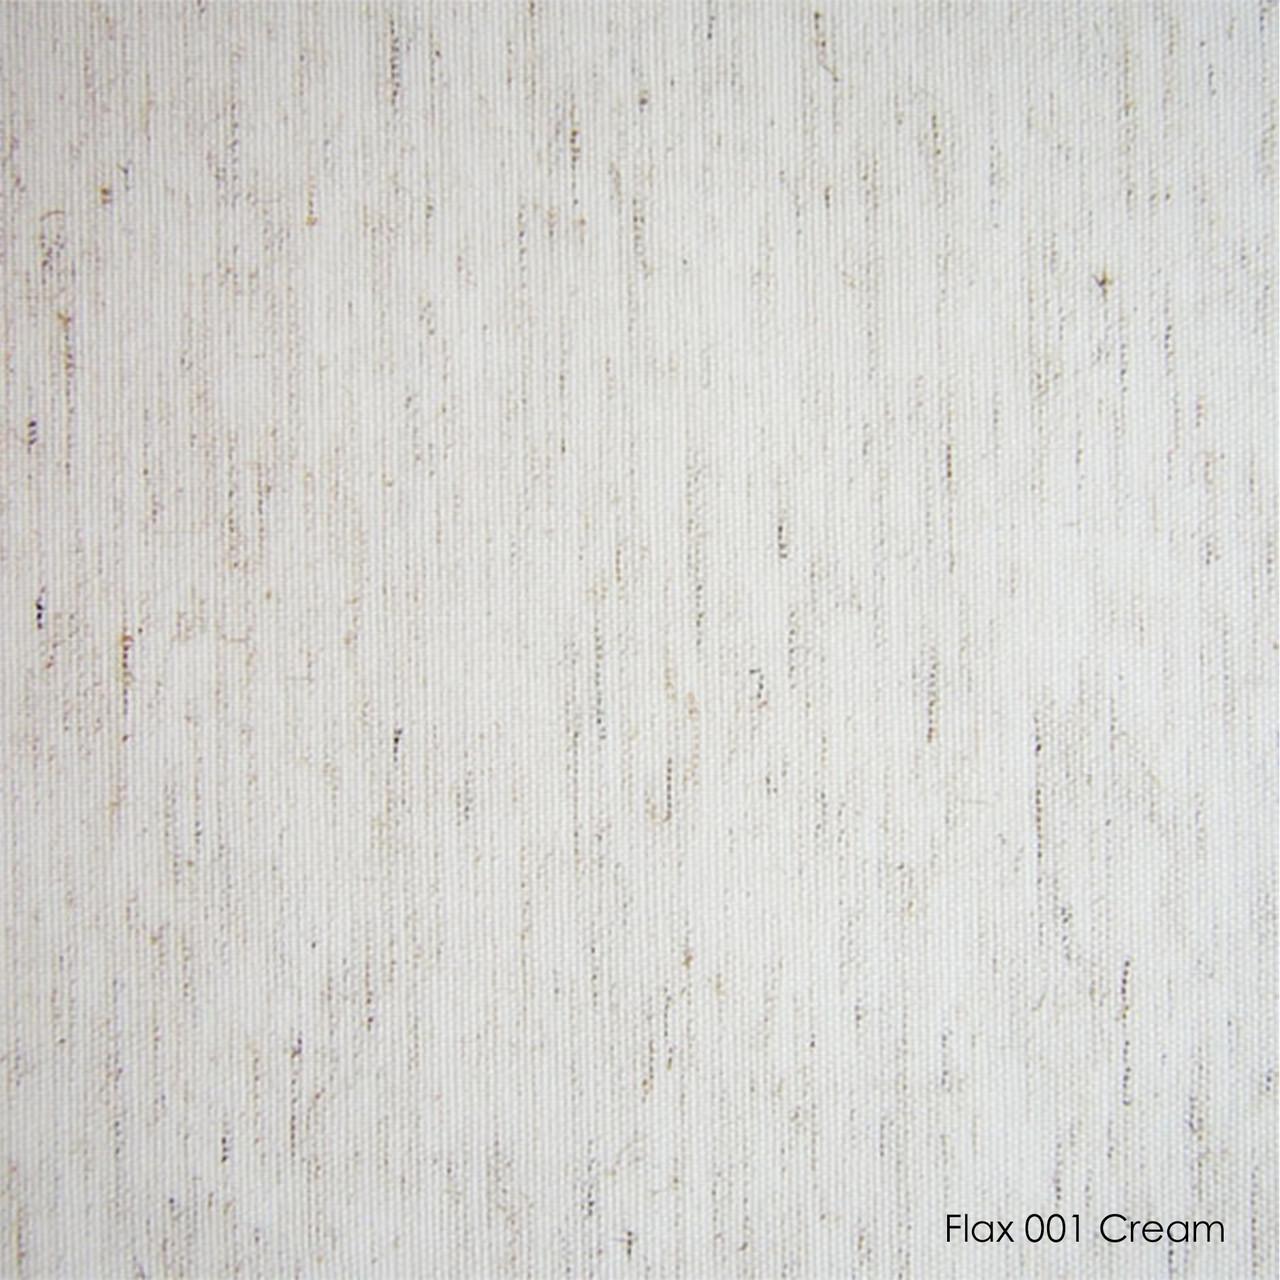 Flax 001 cream